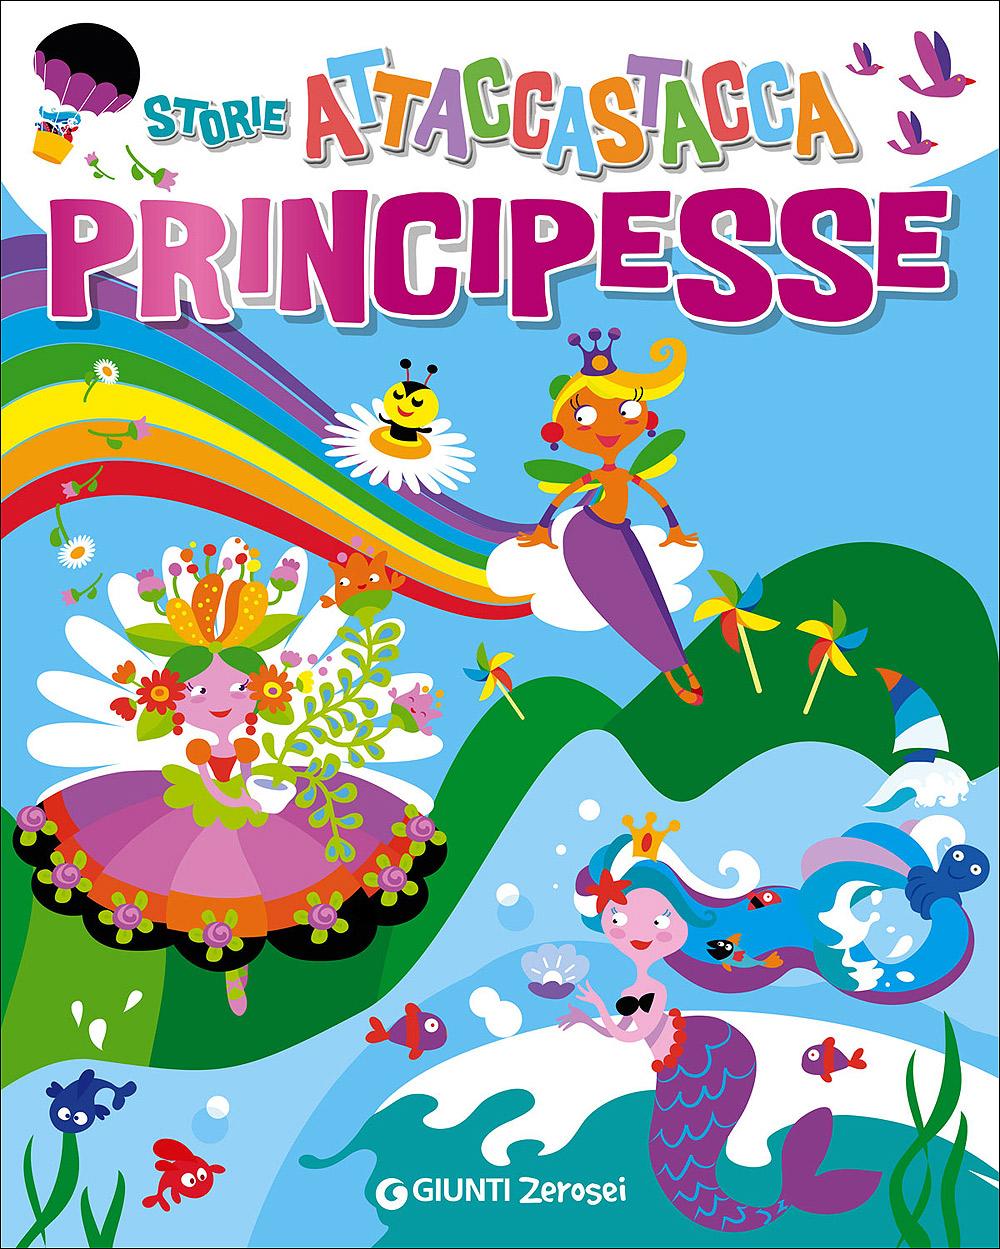 Storie attaccastacca - Principesse